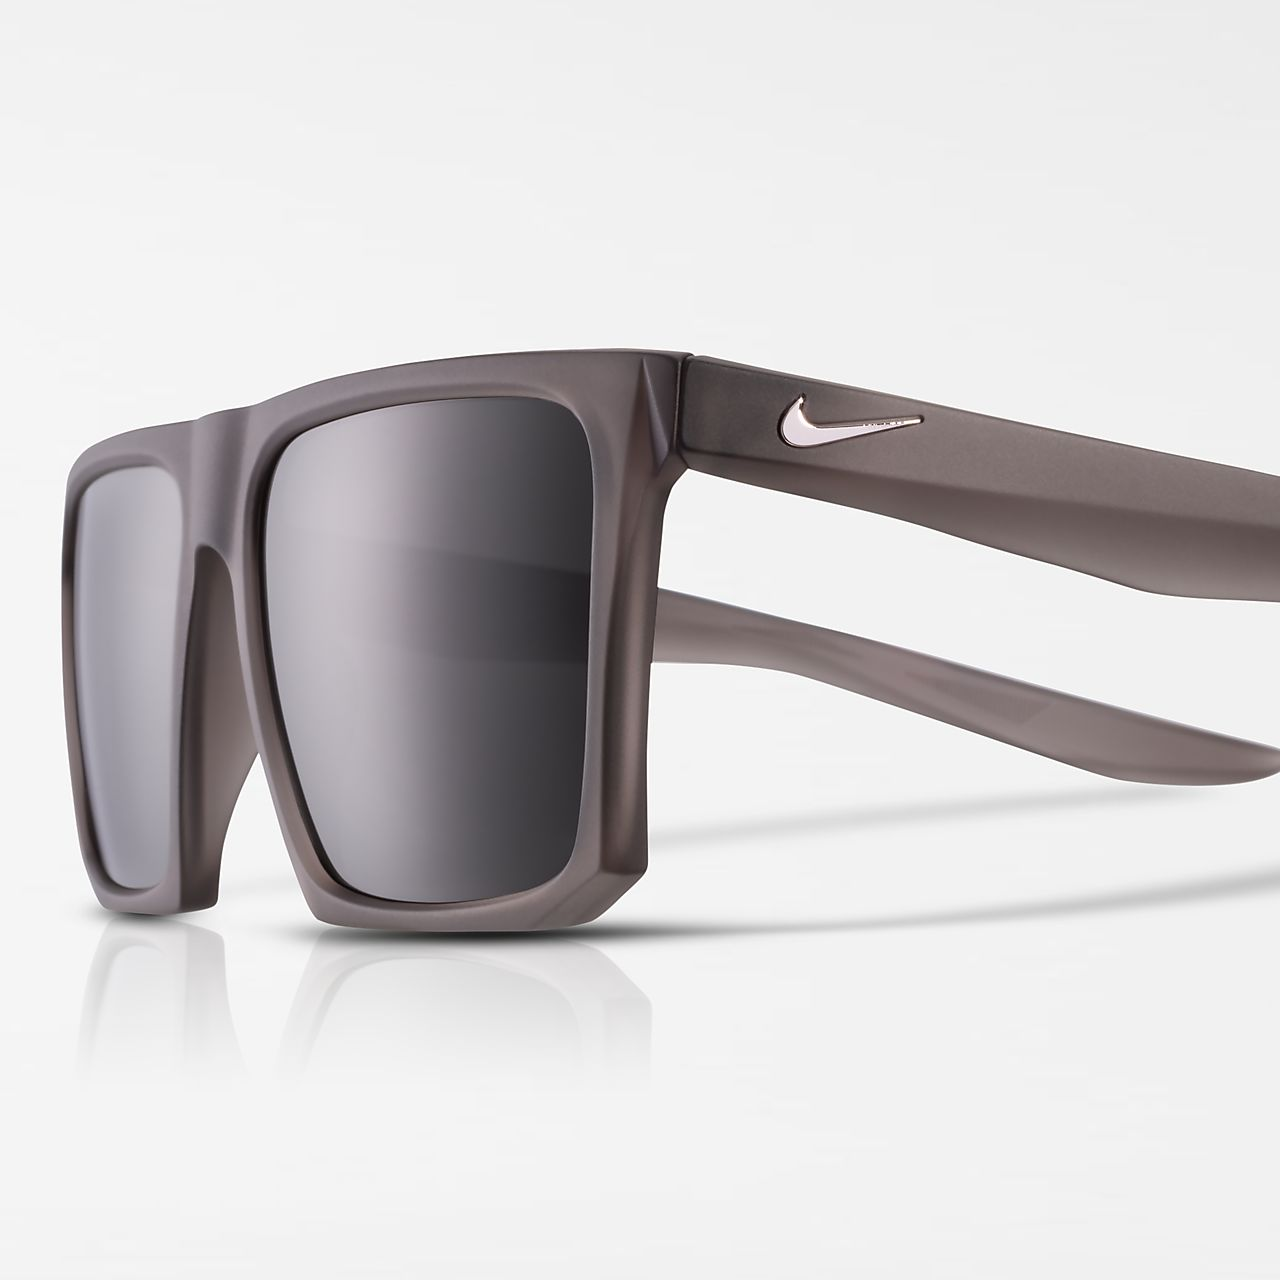 Nike SB Ledge Sunglasses